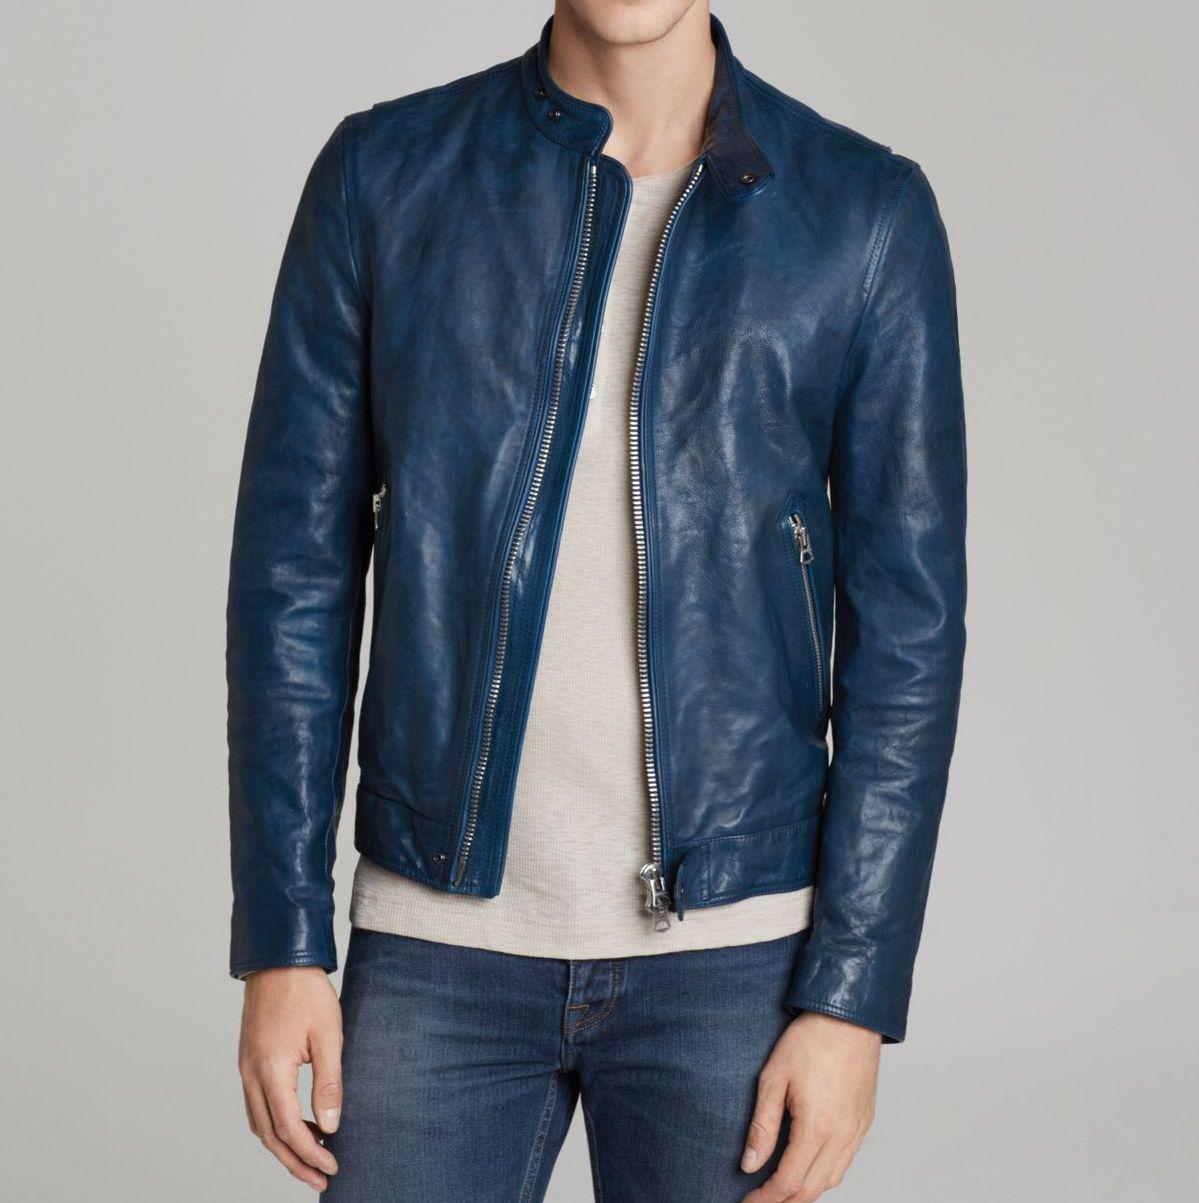 New Men's Stylish Lambskin Genuine Leather Motorcycle Biker Slim Fit Jacket GN11